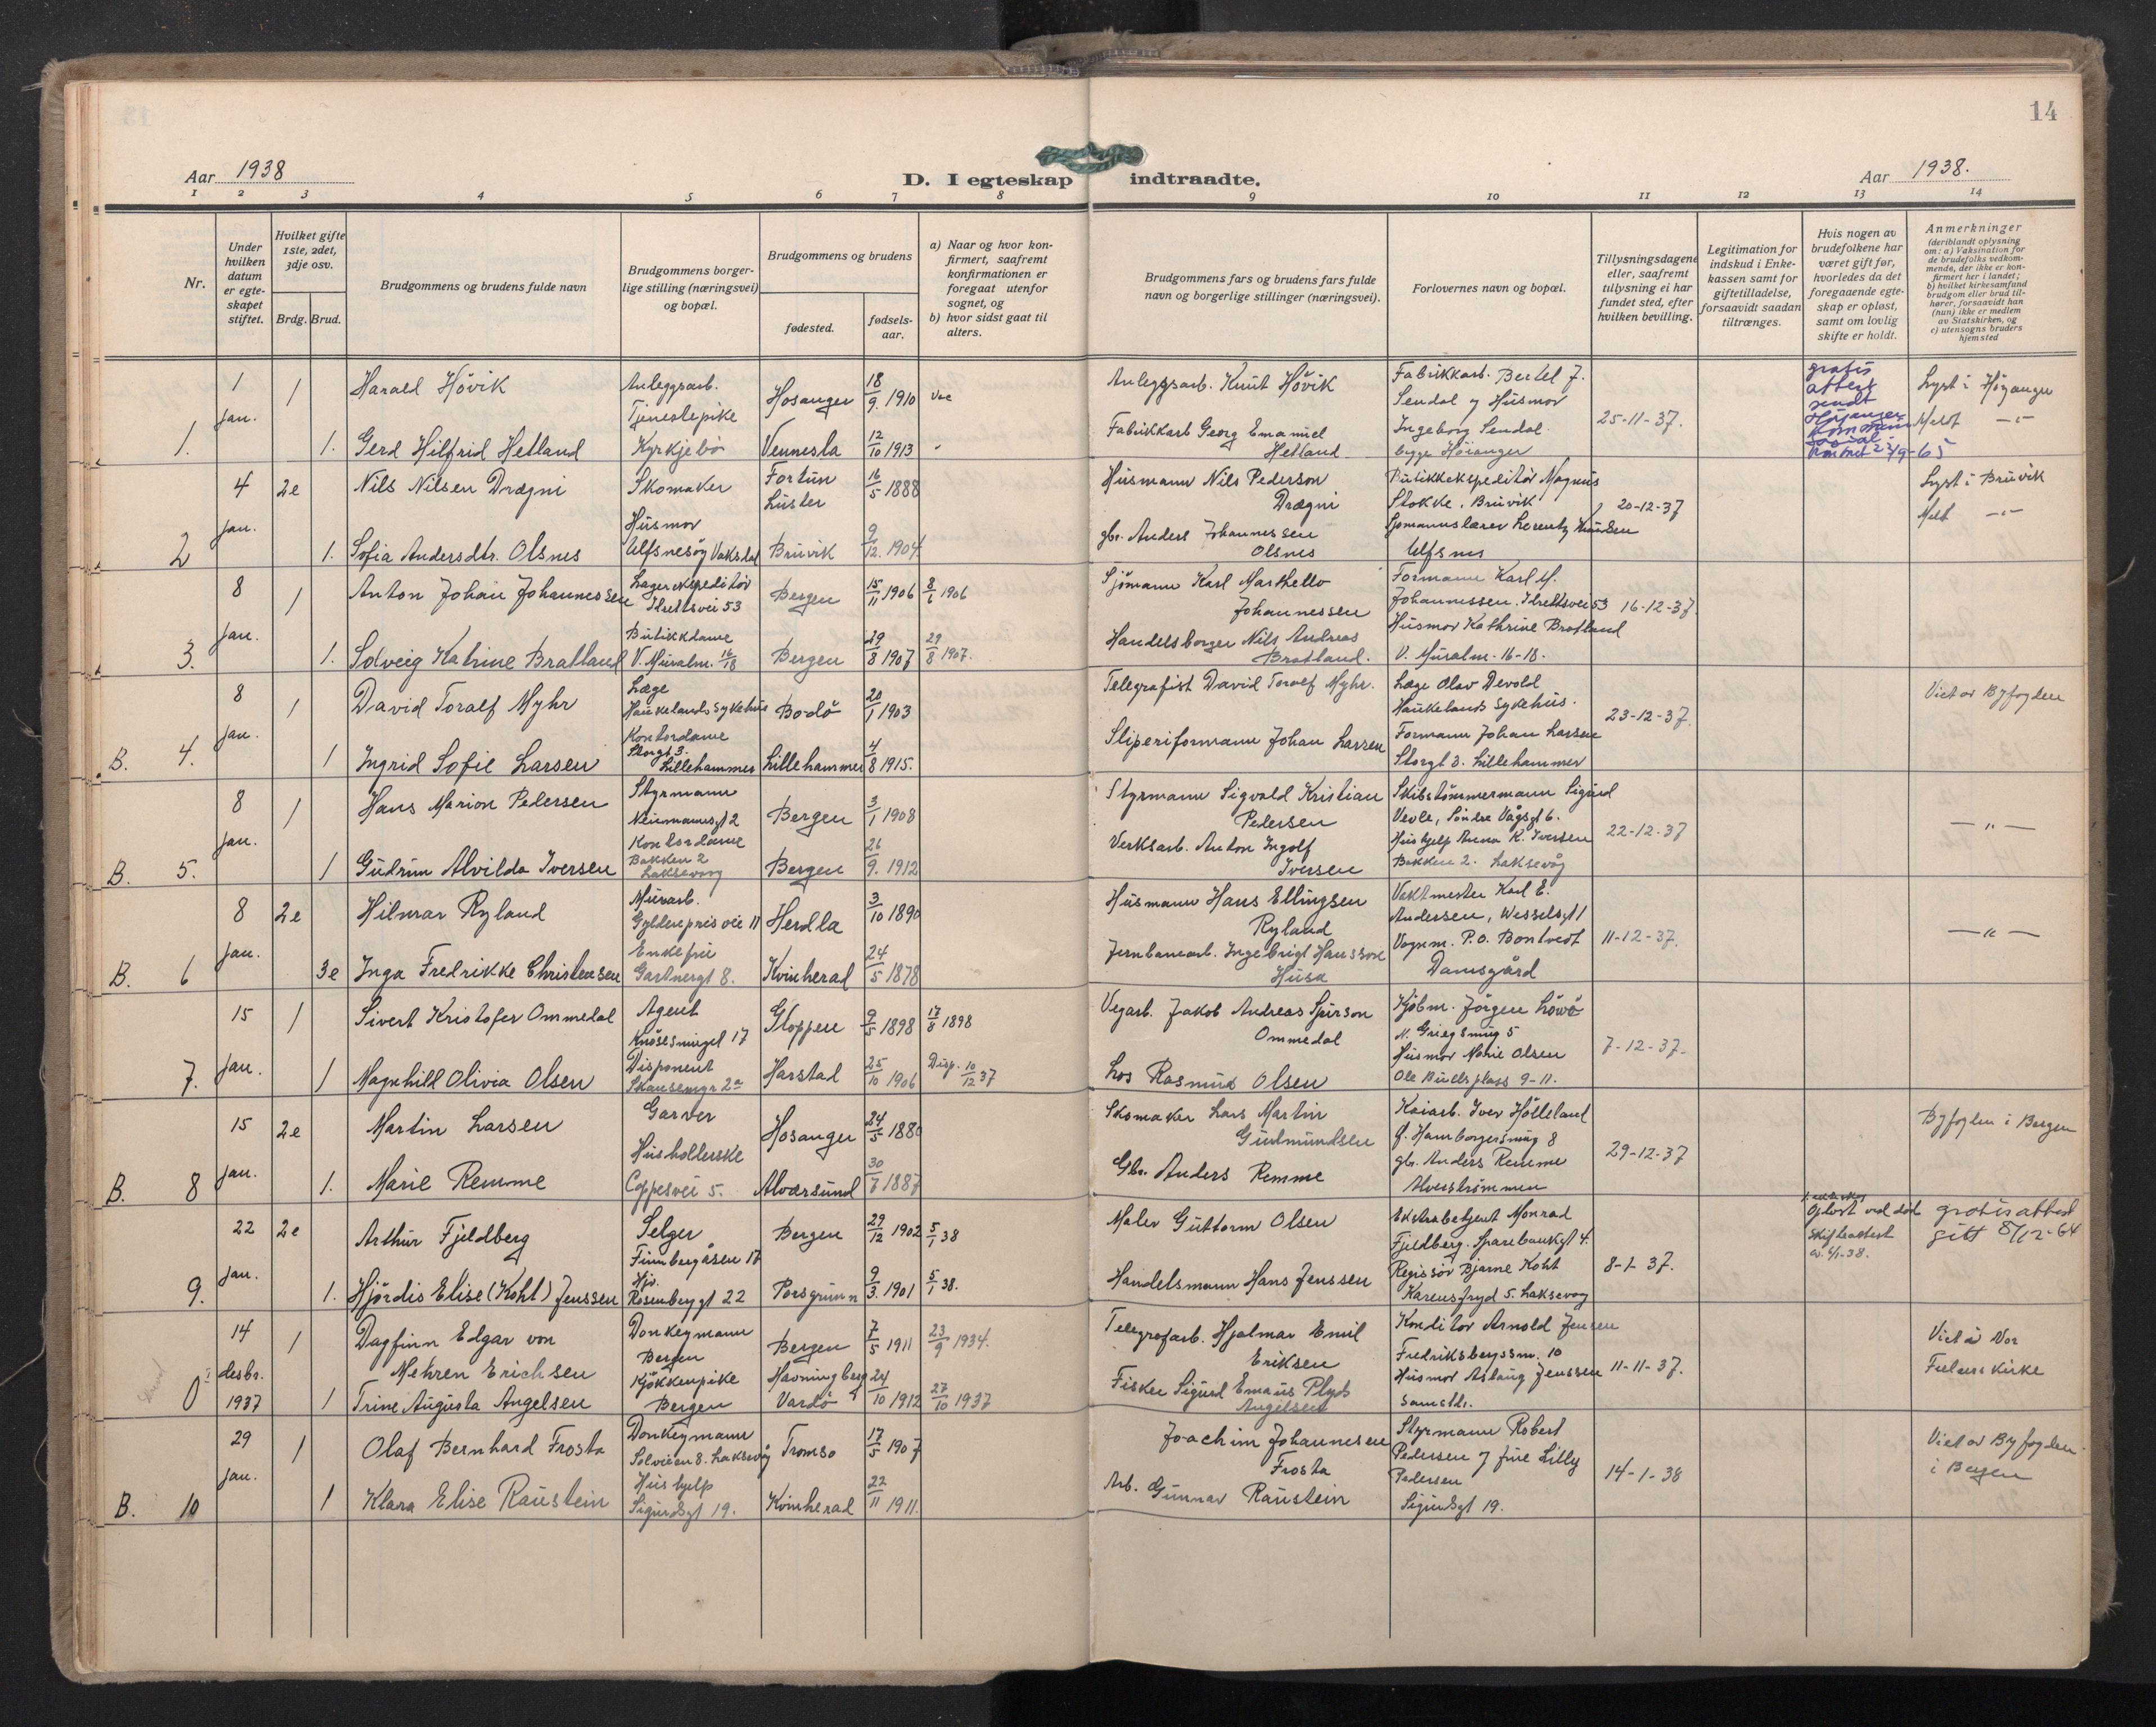 SAB, Domkirken Sokneprestembete, H/Haa: Ministerialbok nr. D 7, 1937-1950, s. 13b-14a